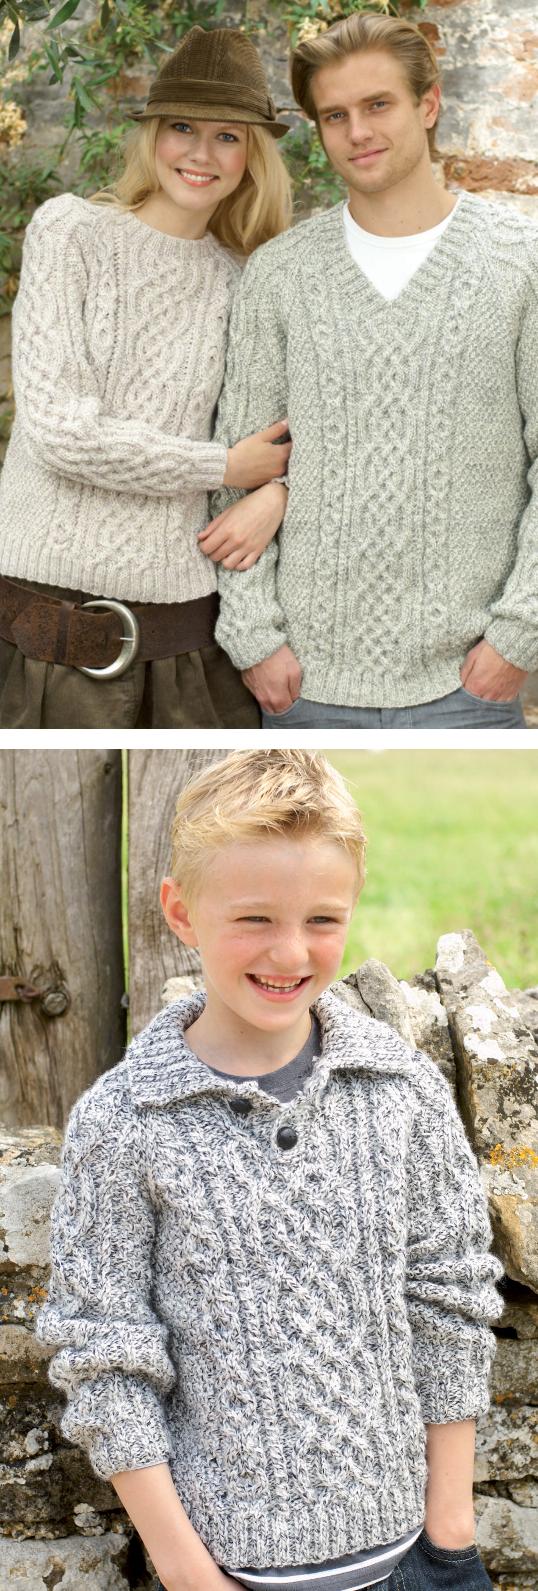 Free Knitting Pattern for Raglan Aran Pullover - Long-sleeved ...